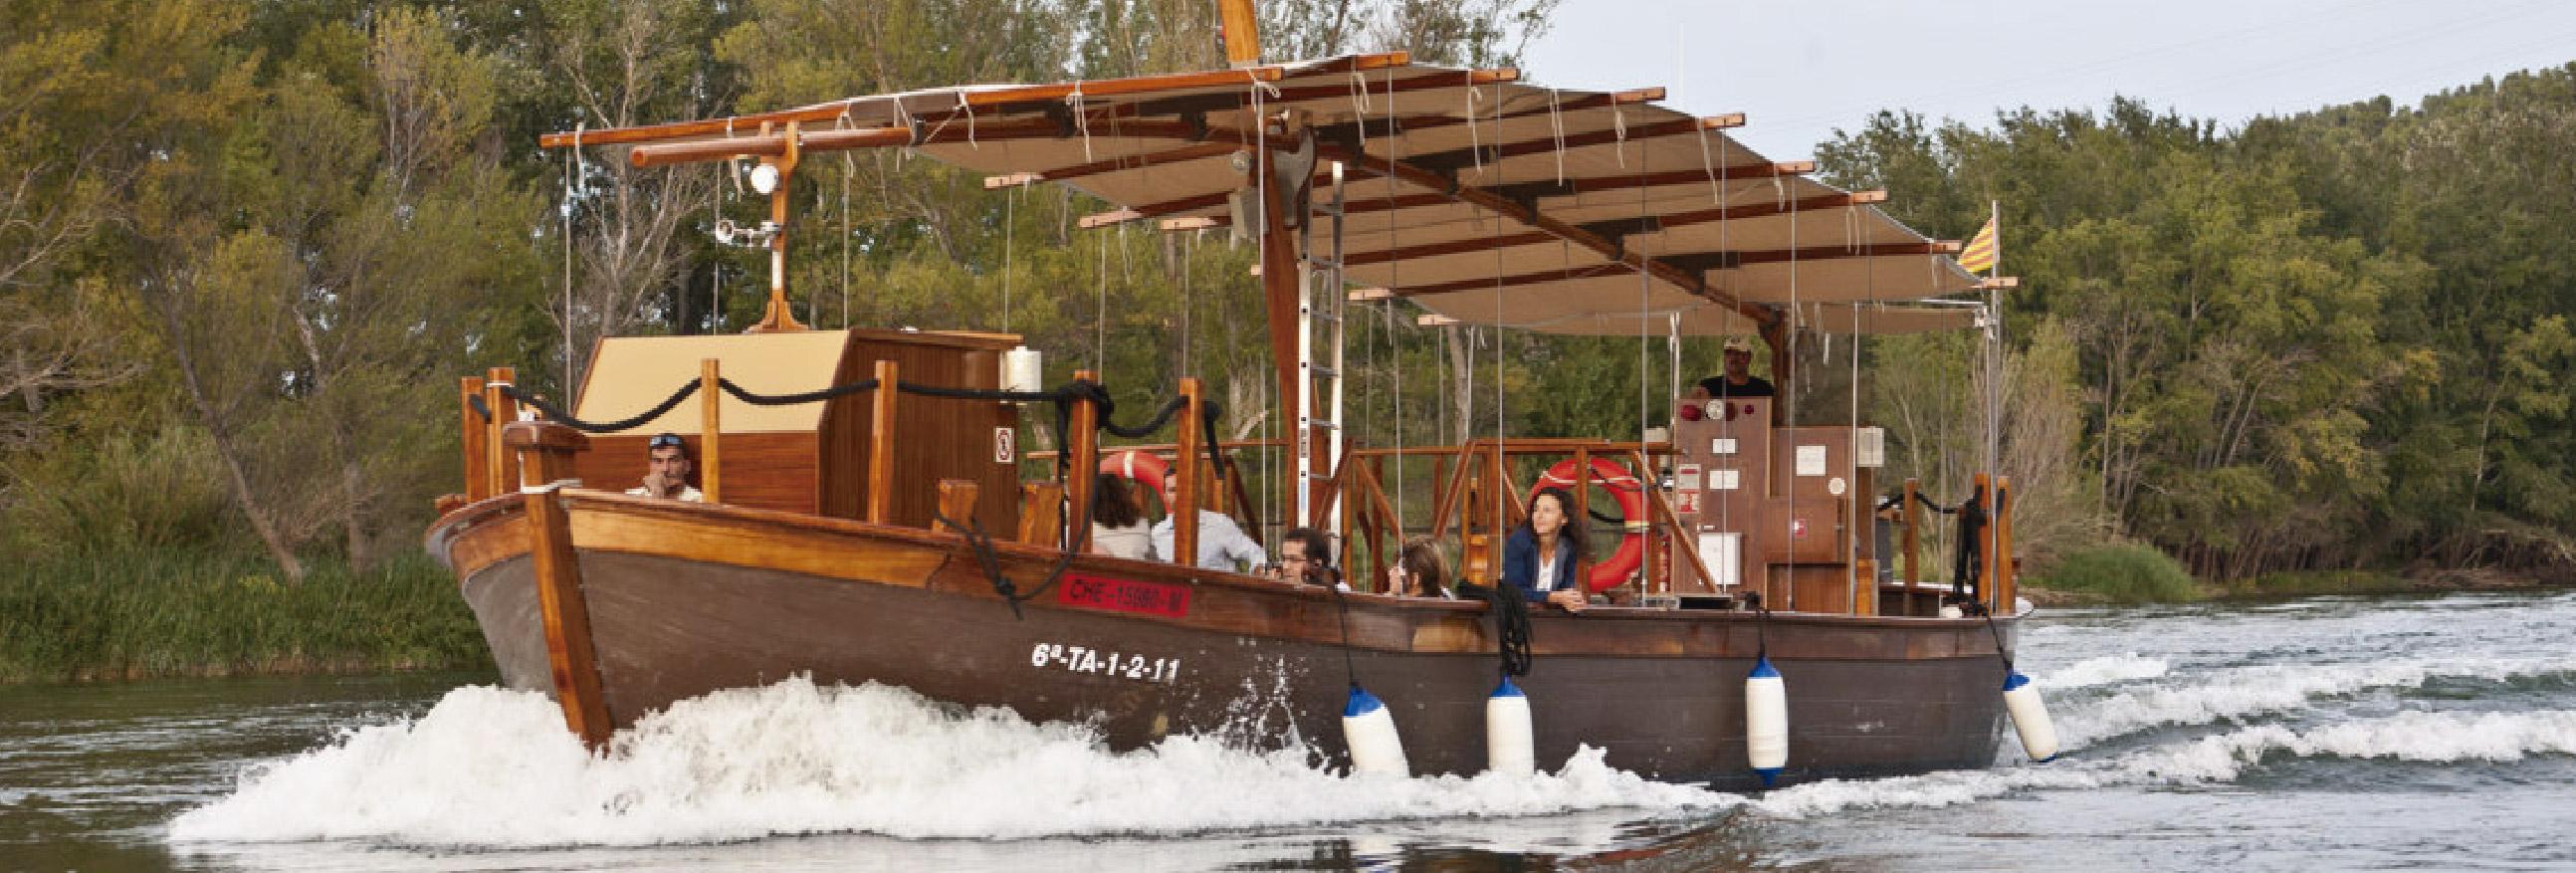 llaut turistic lo roget asco navegar ebre-01